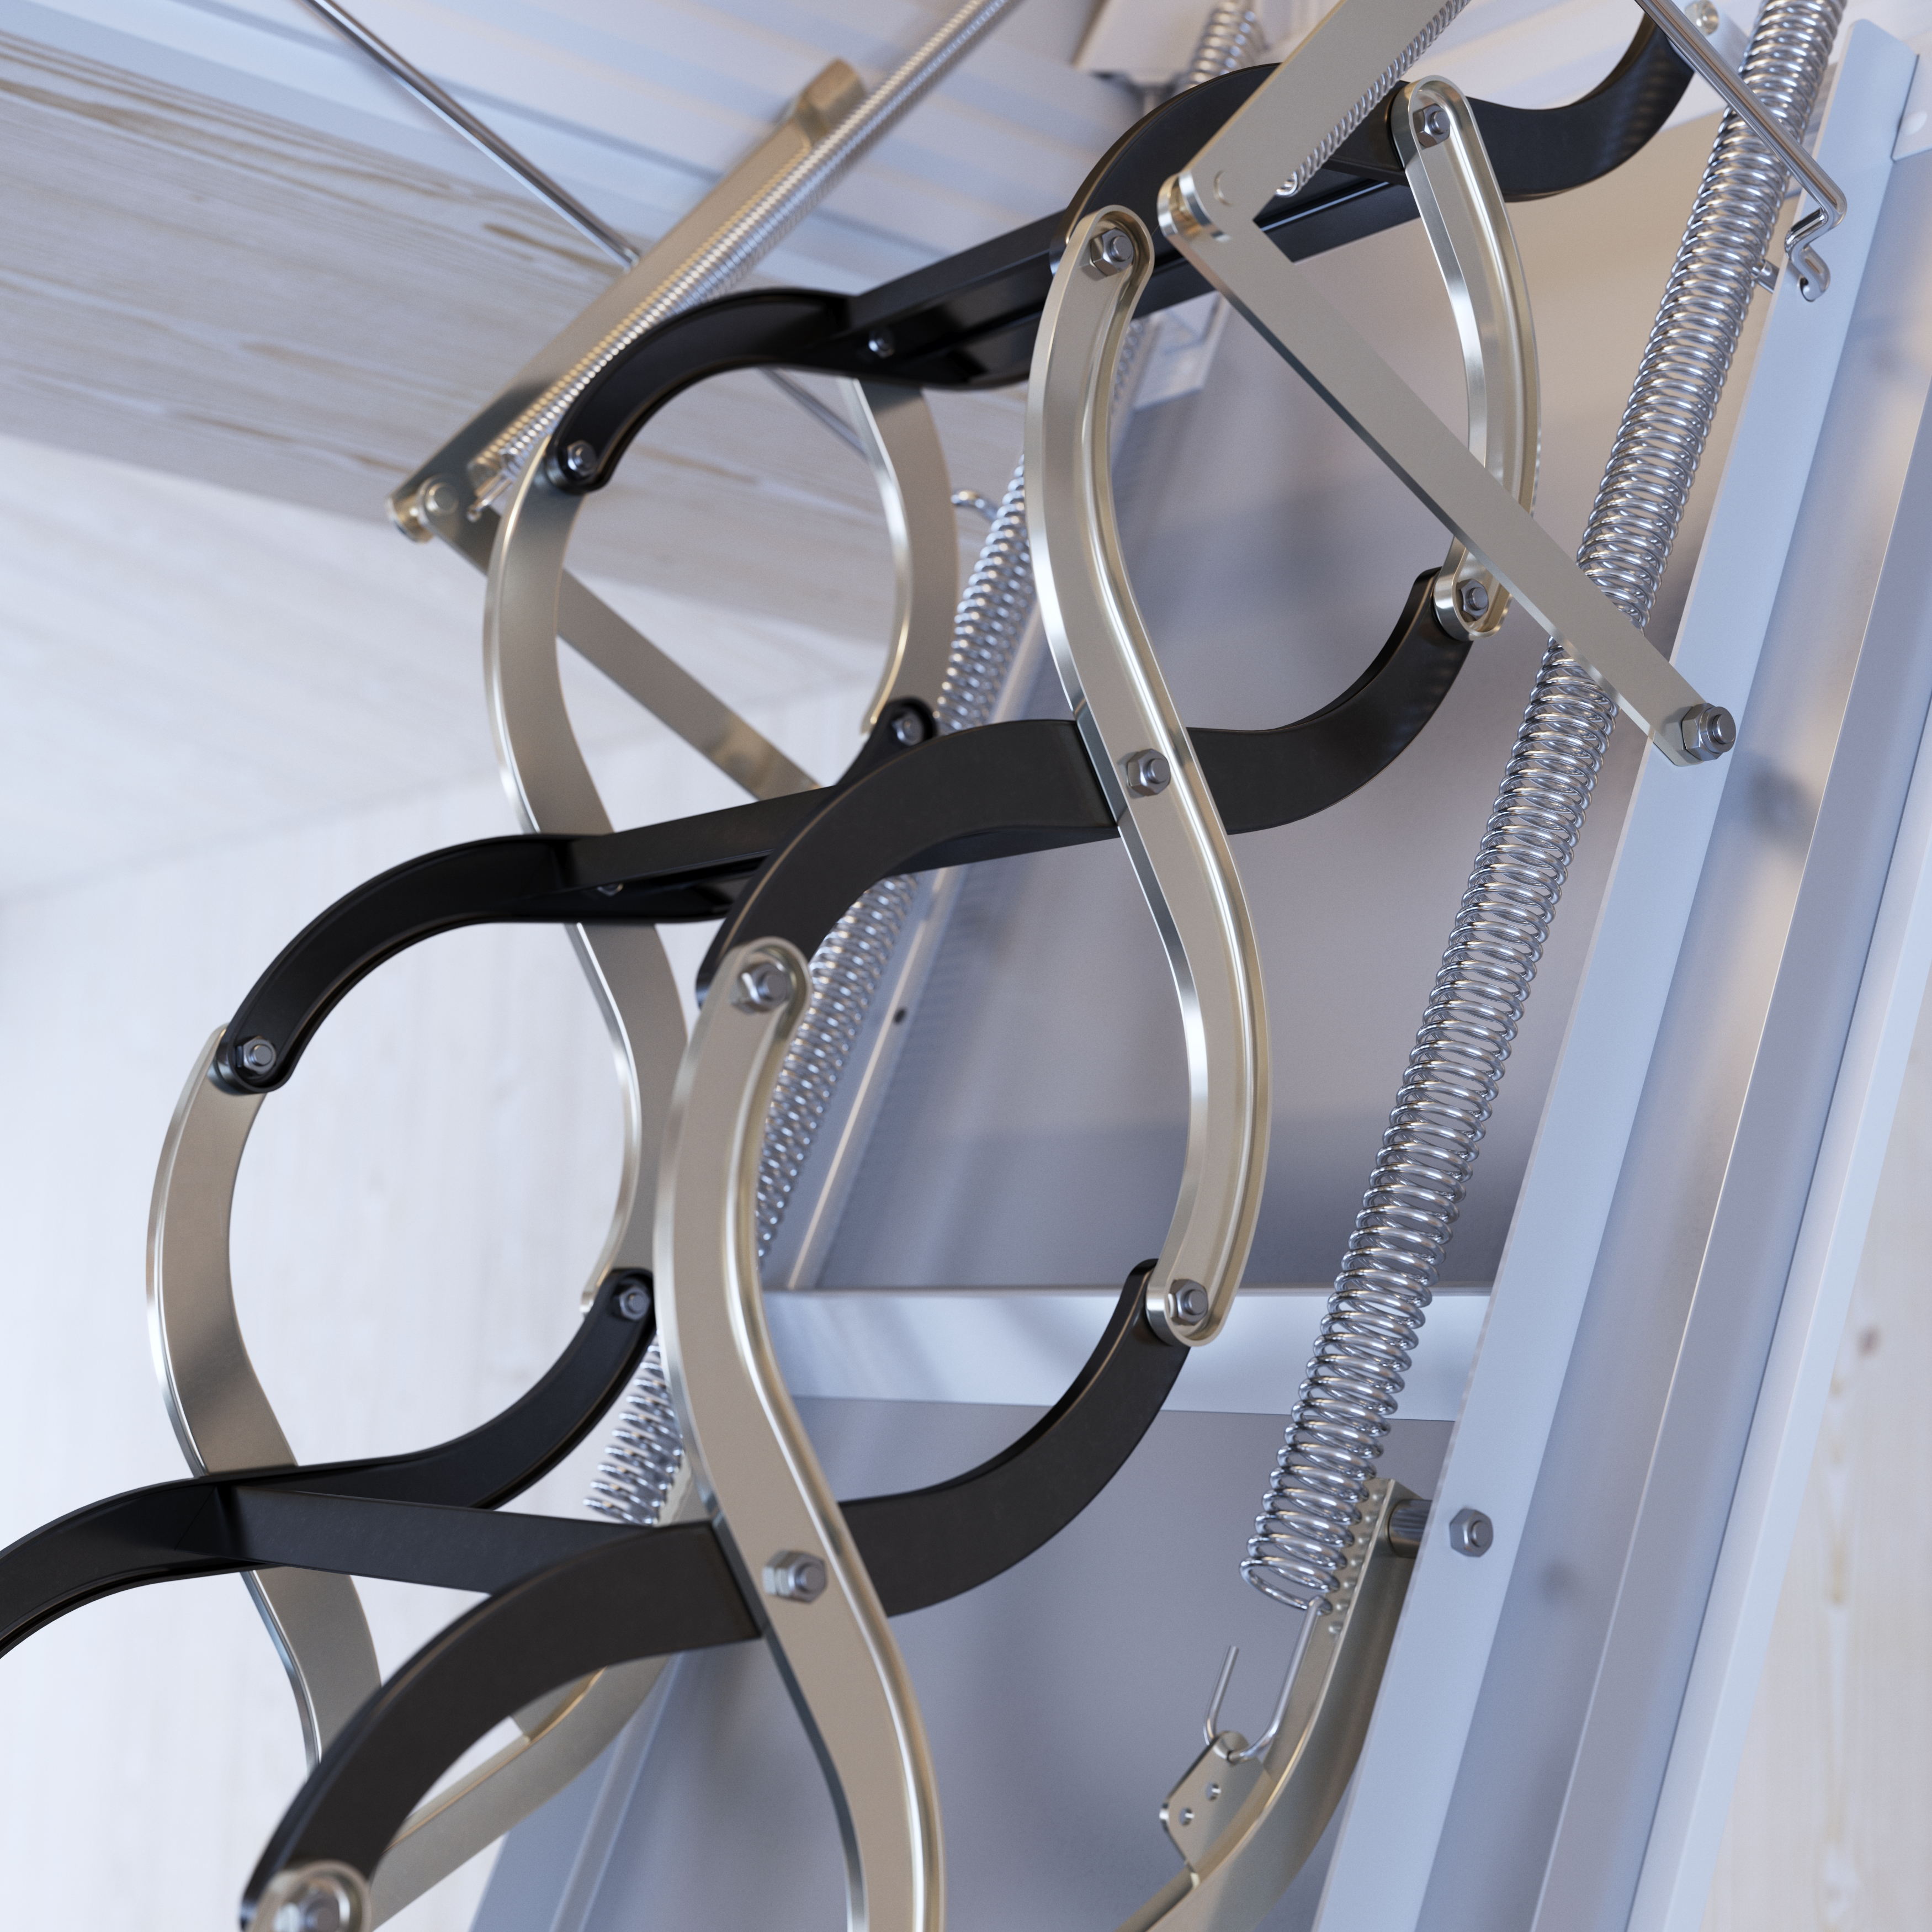 stahovaci schody LUSSO PP detail foto zdroj JAP FUTURE